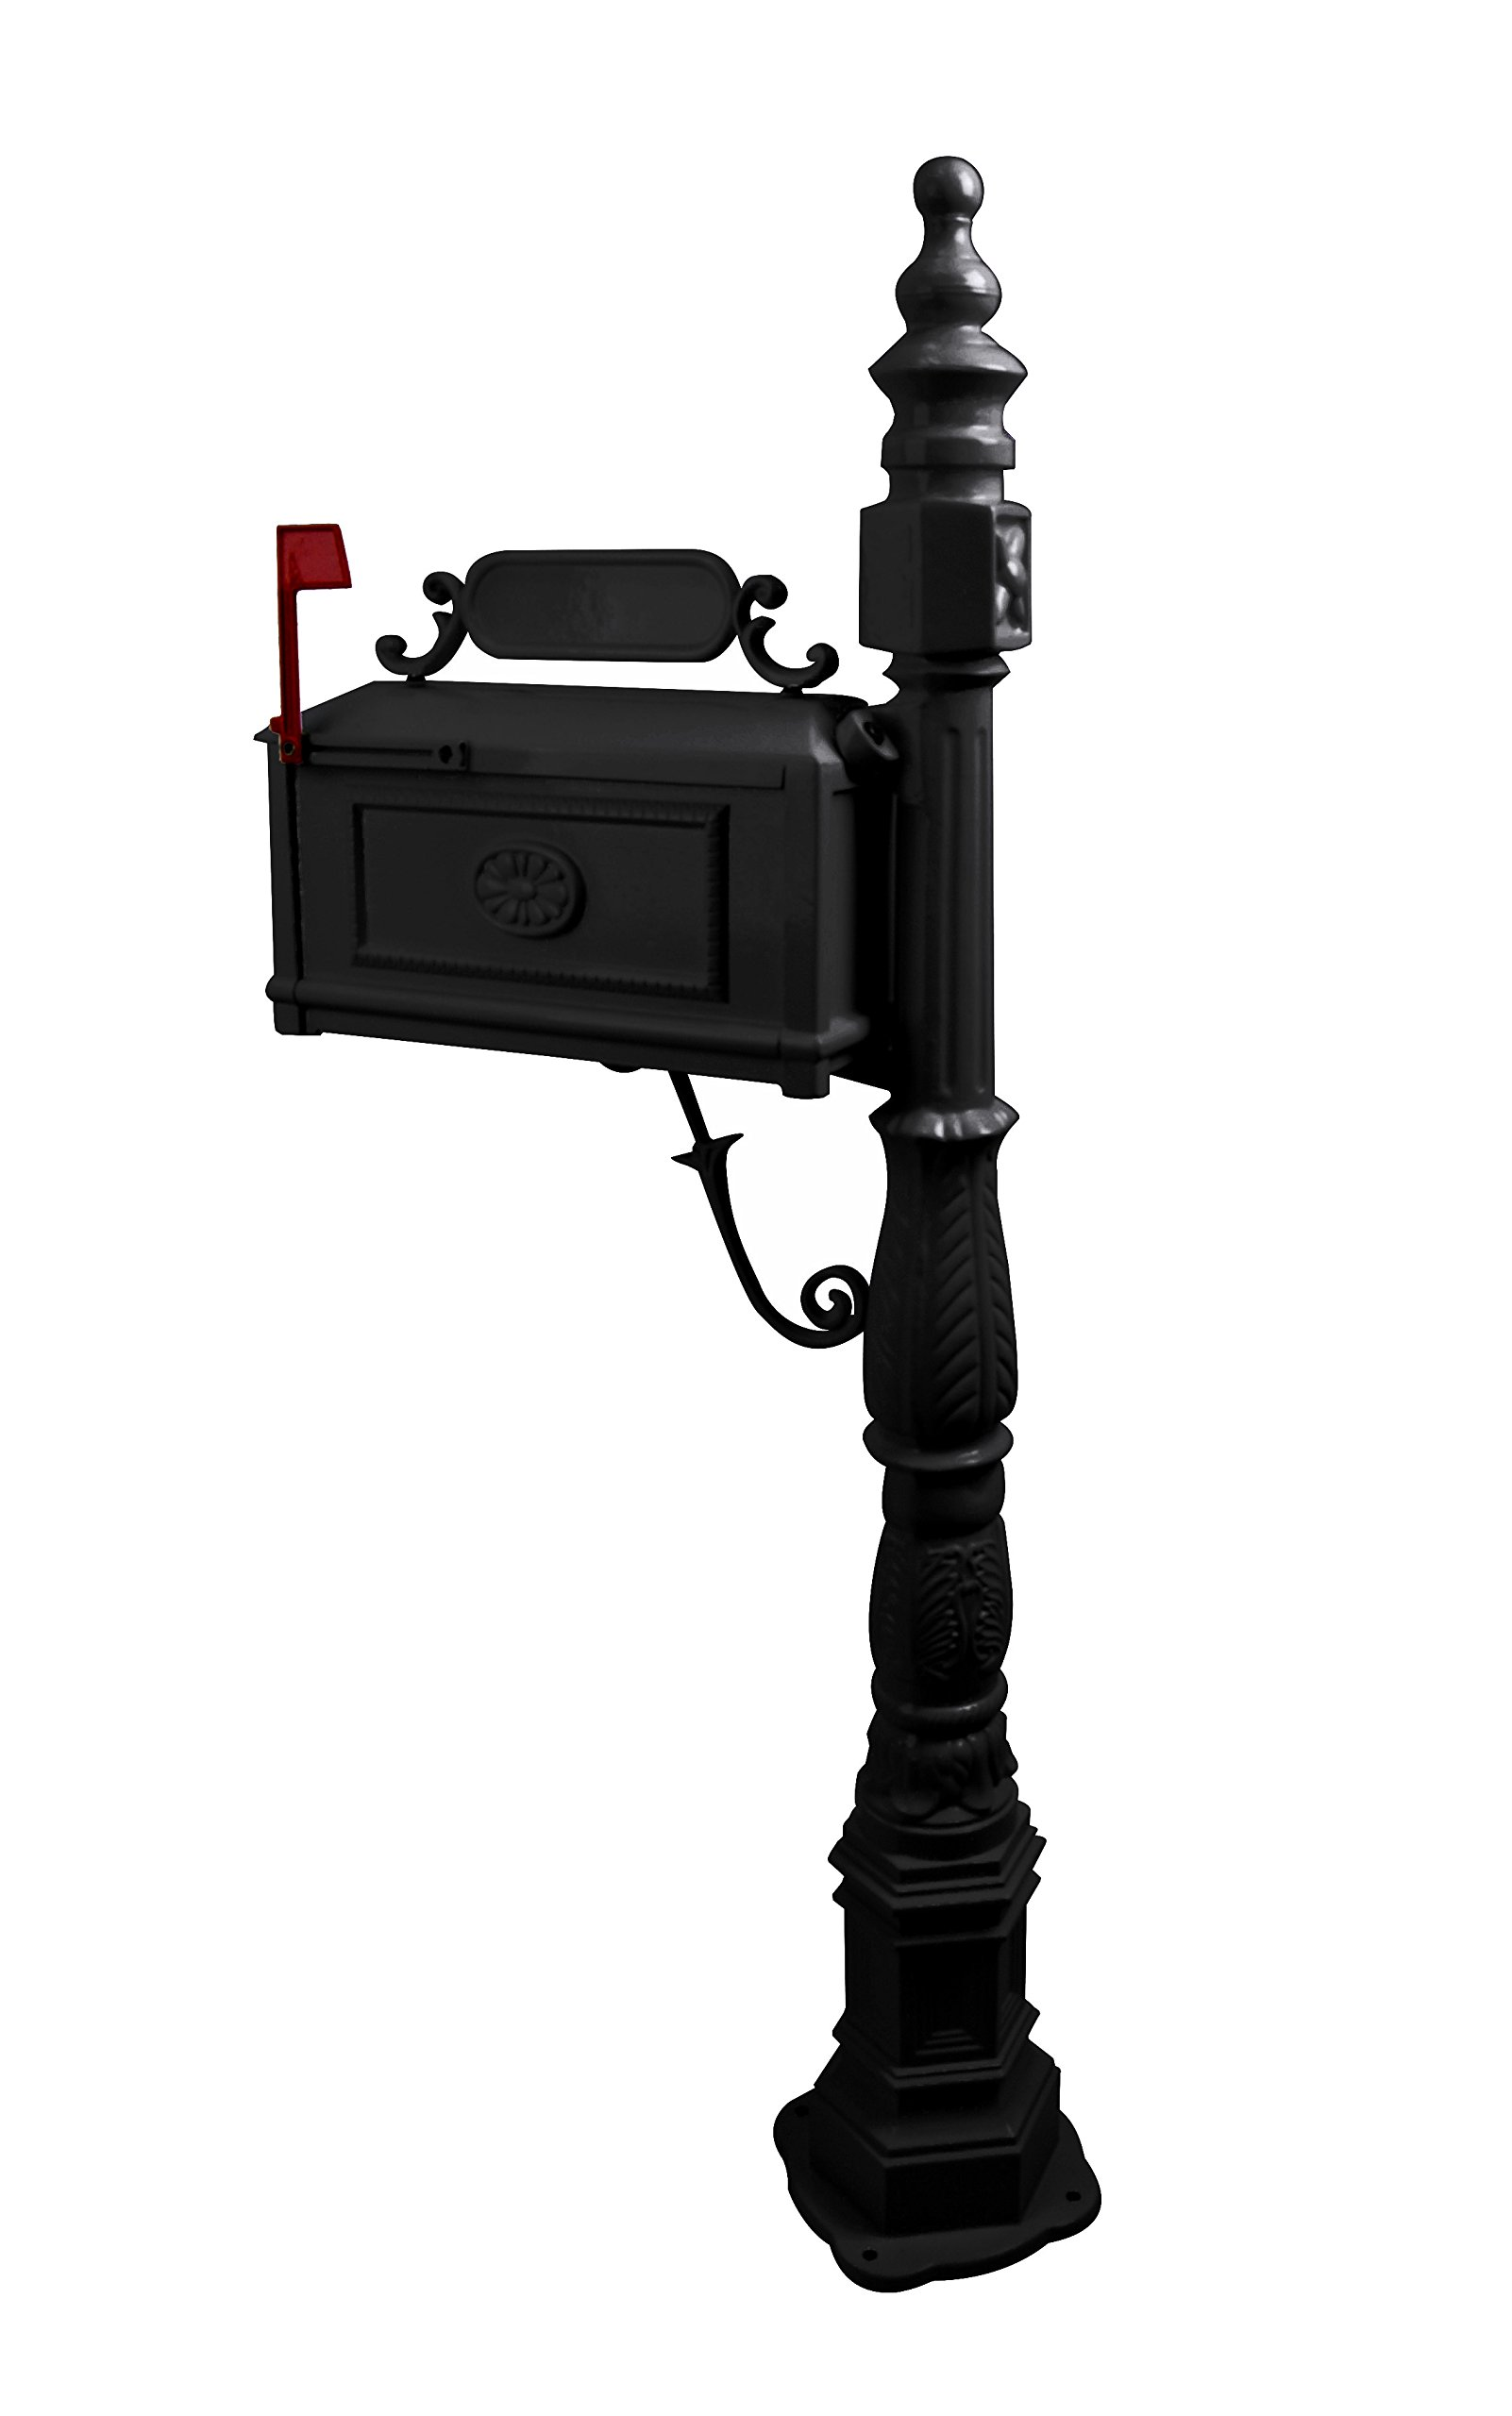 Post Mailbox Combination Stratford Heavy Duty Mail Box Cast Aluminum (Black)